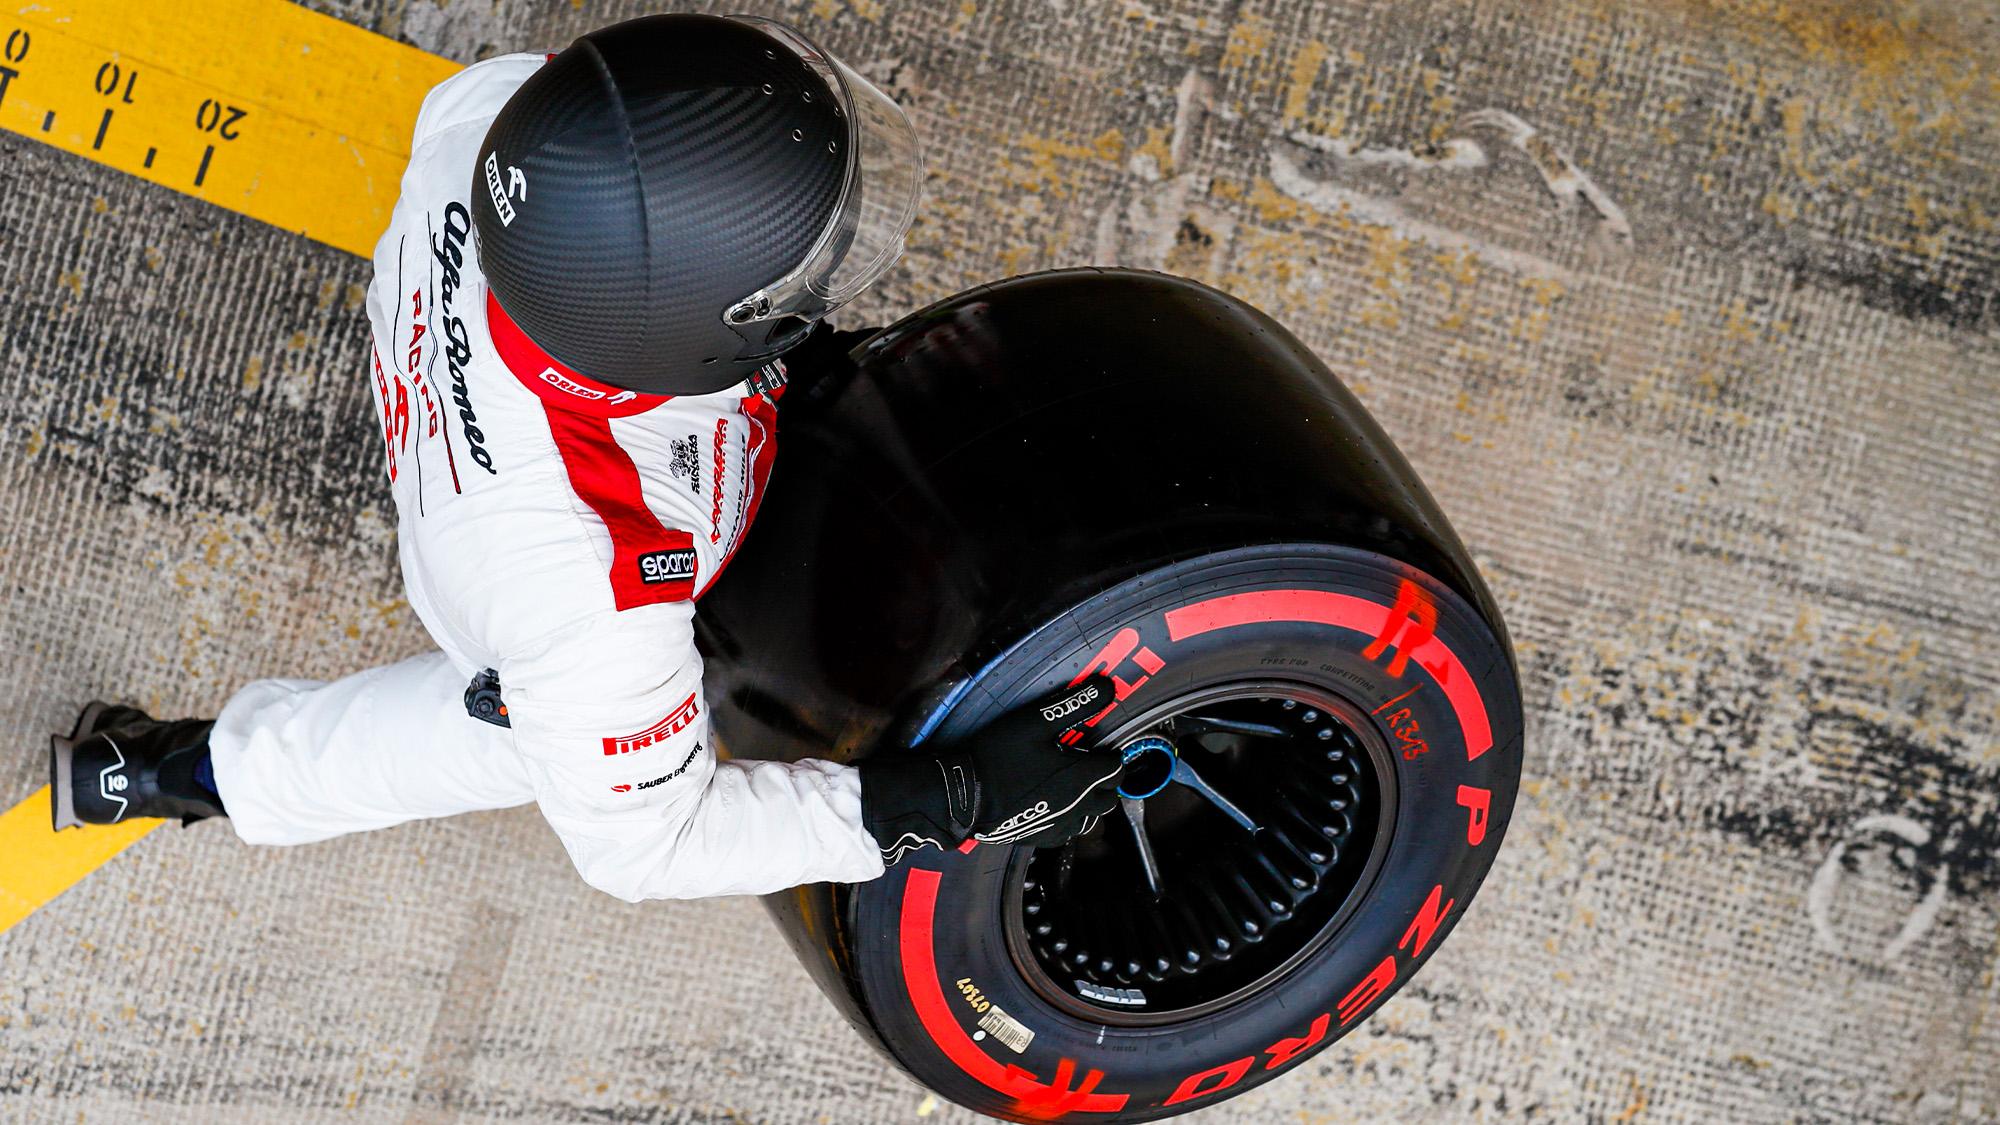 F1 mechanic carries a Pirelli tyre